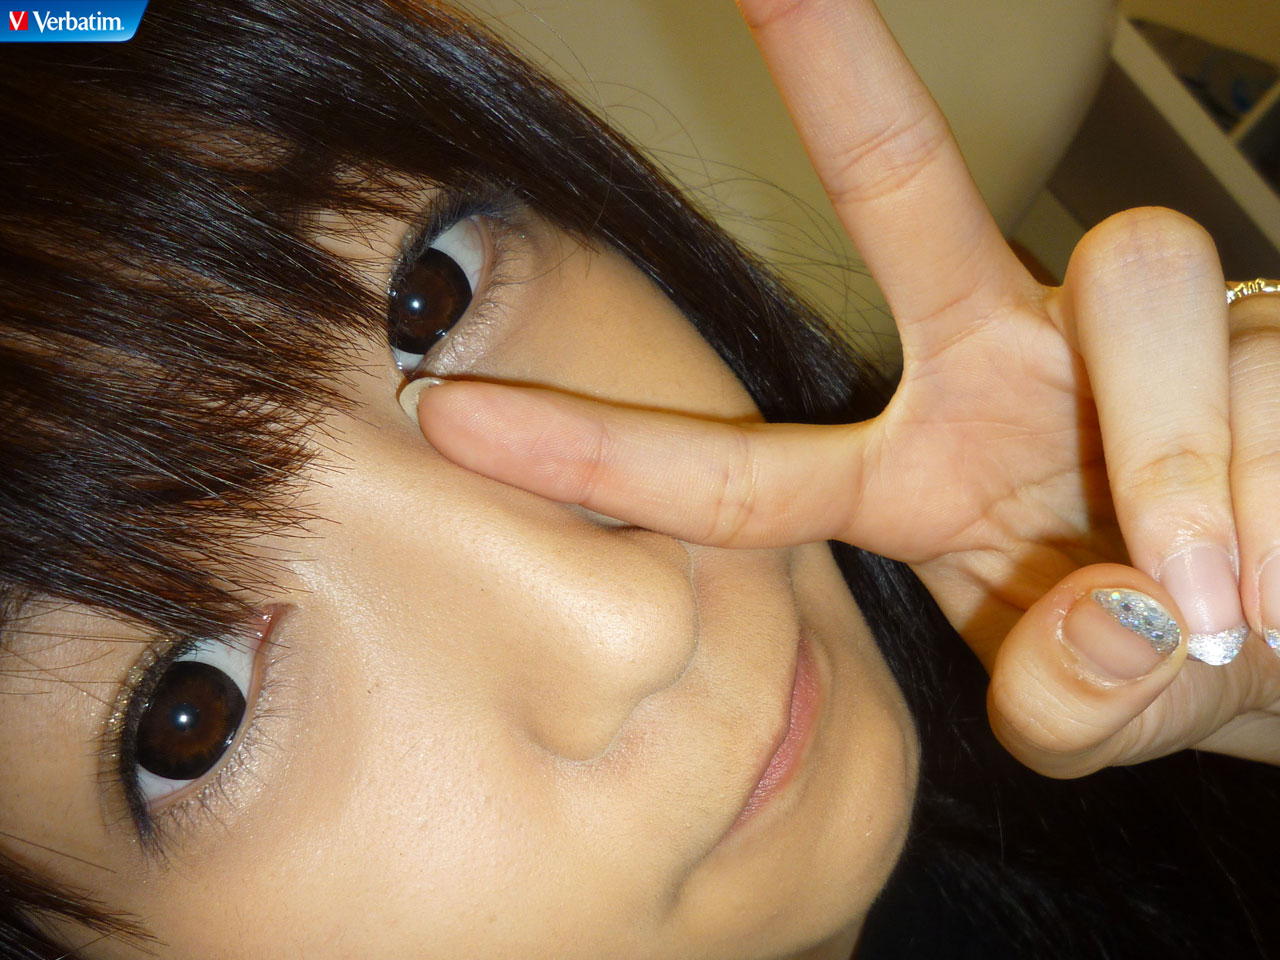 AKB48 佐藤亜美菜 セクシー 顔アップ ピース カメラ目線 ぶっかけ用 高画質 エロかわいい画像